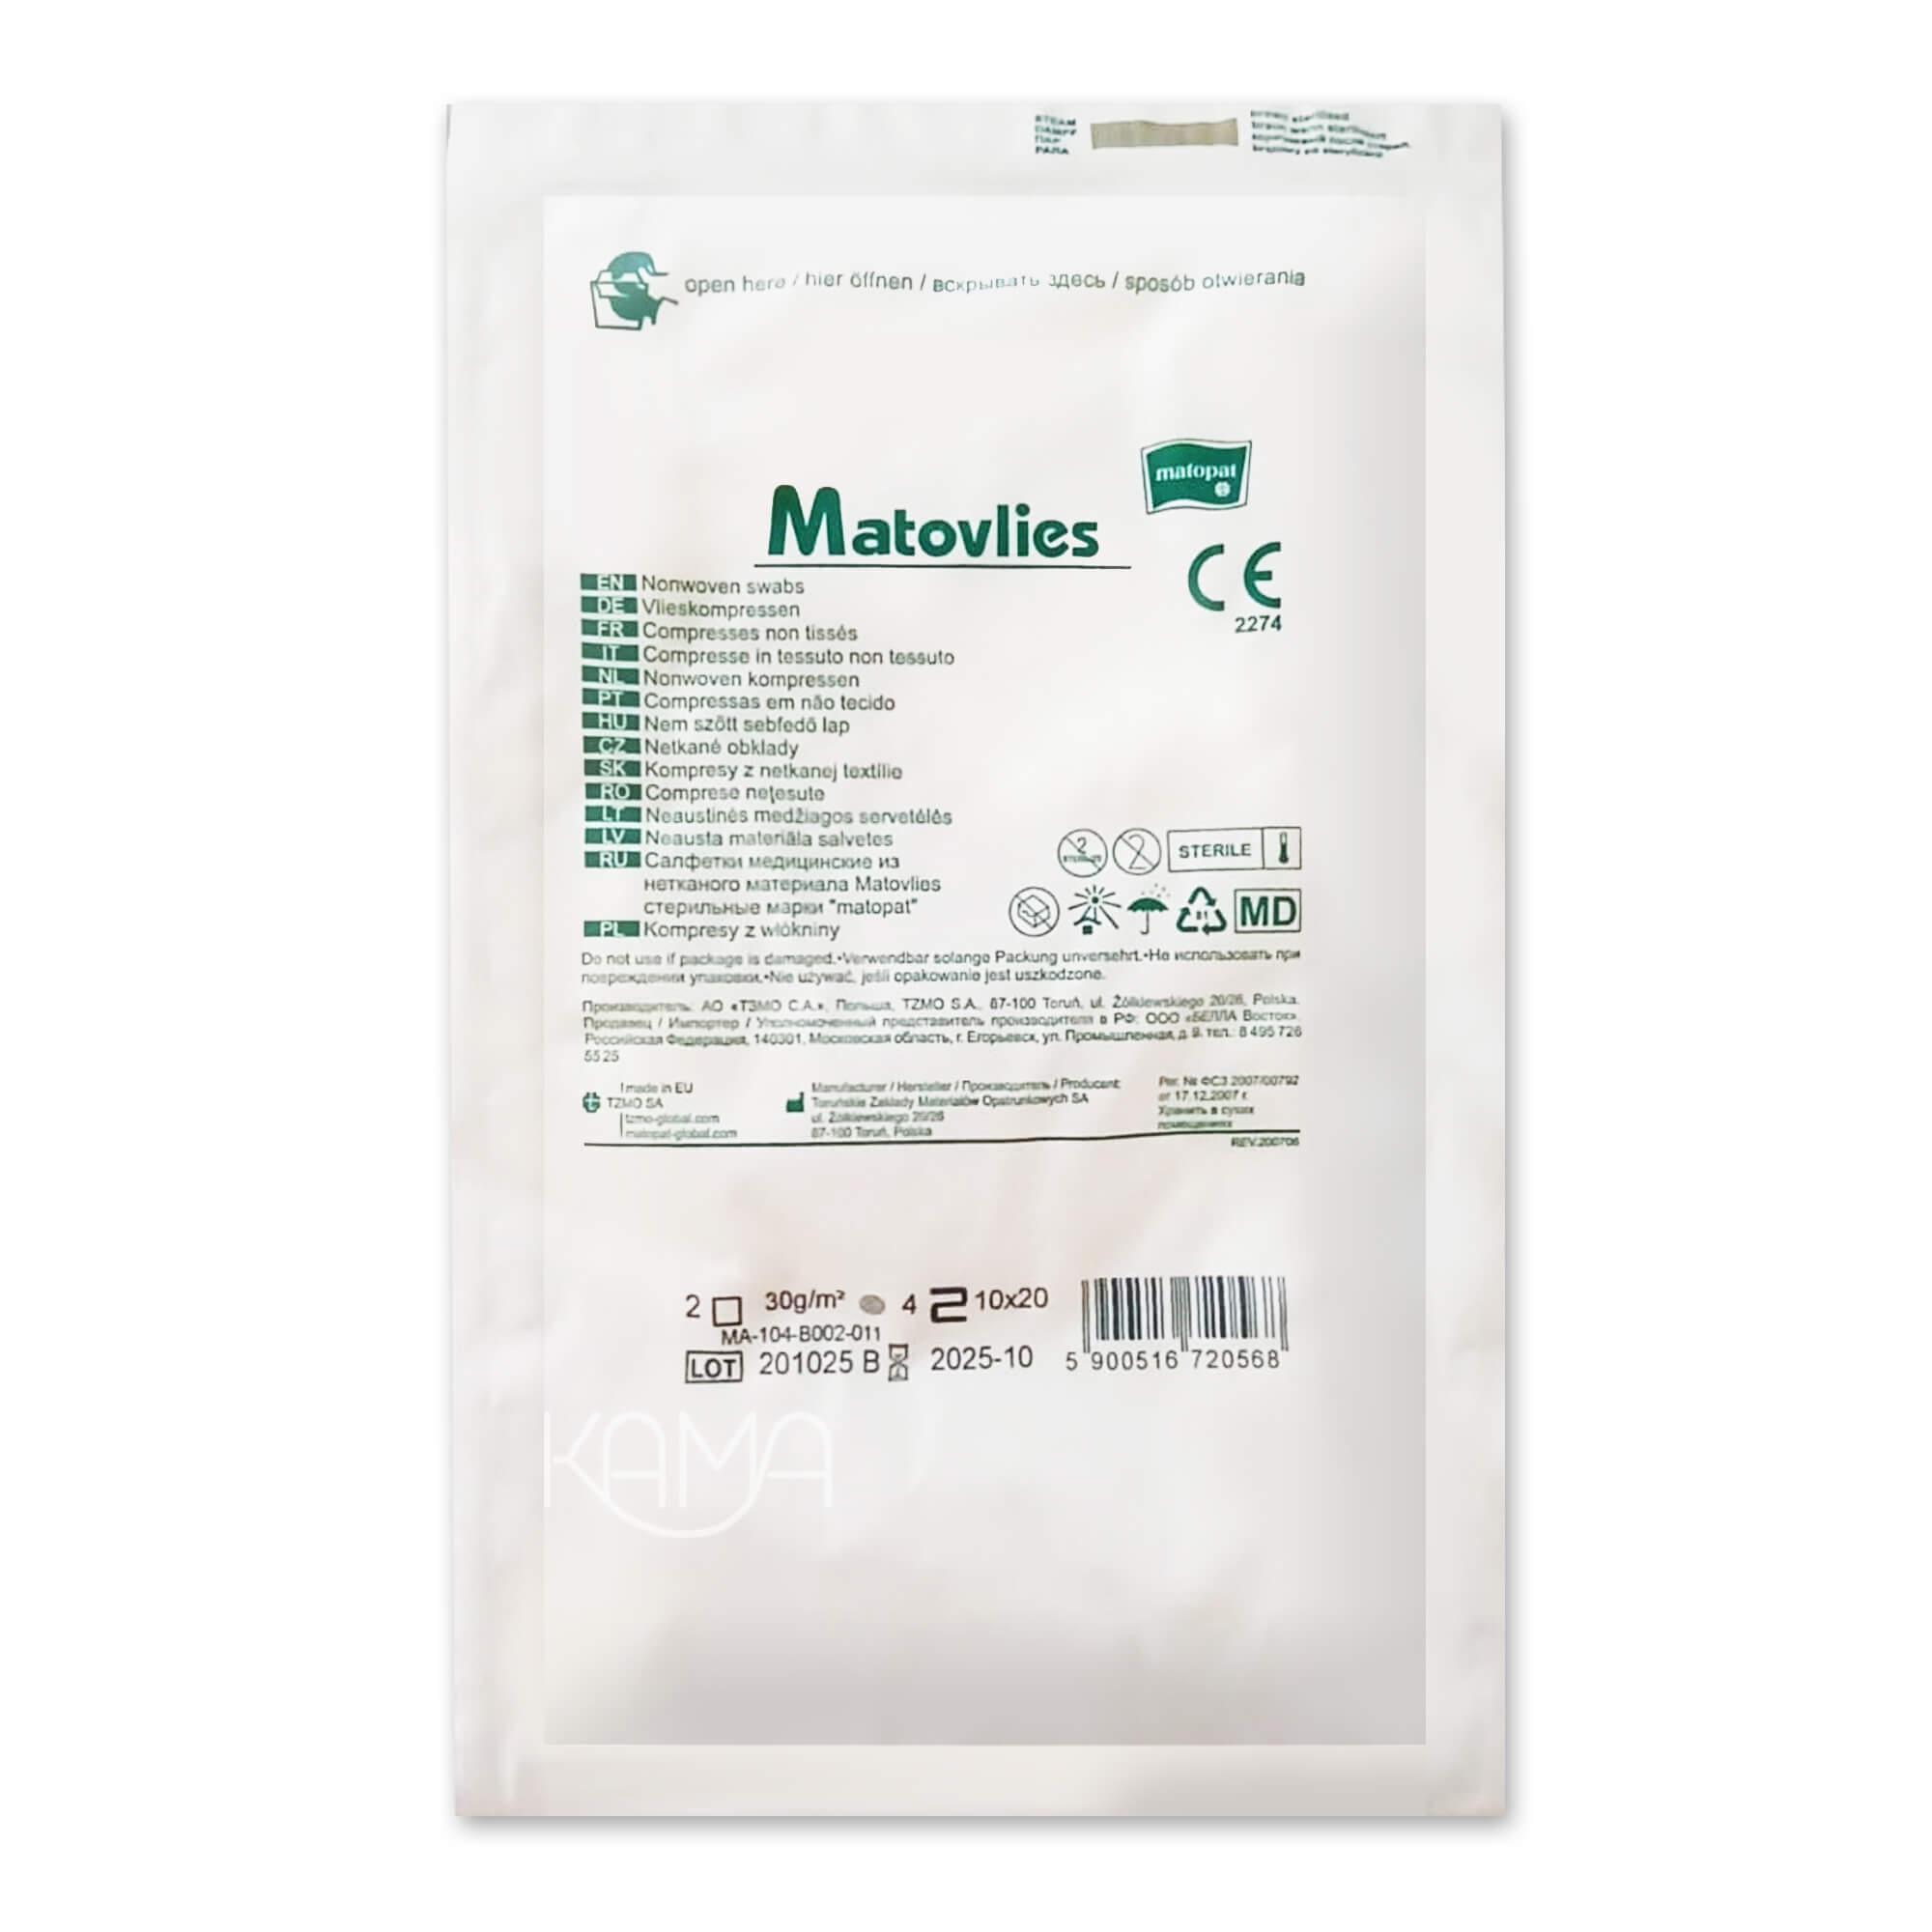 Салфетки нетканые абсорбирующий Матовлис 30 г  4-сл. 10х20 см